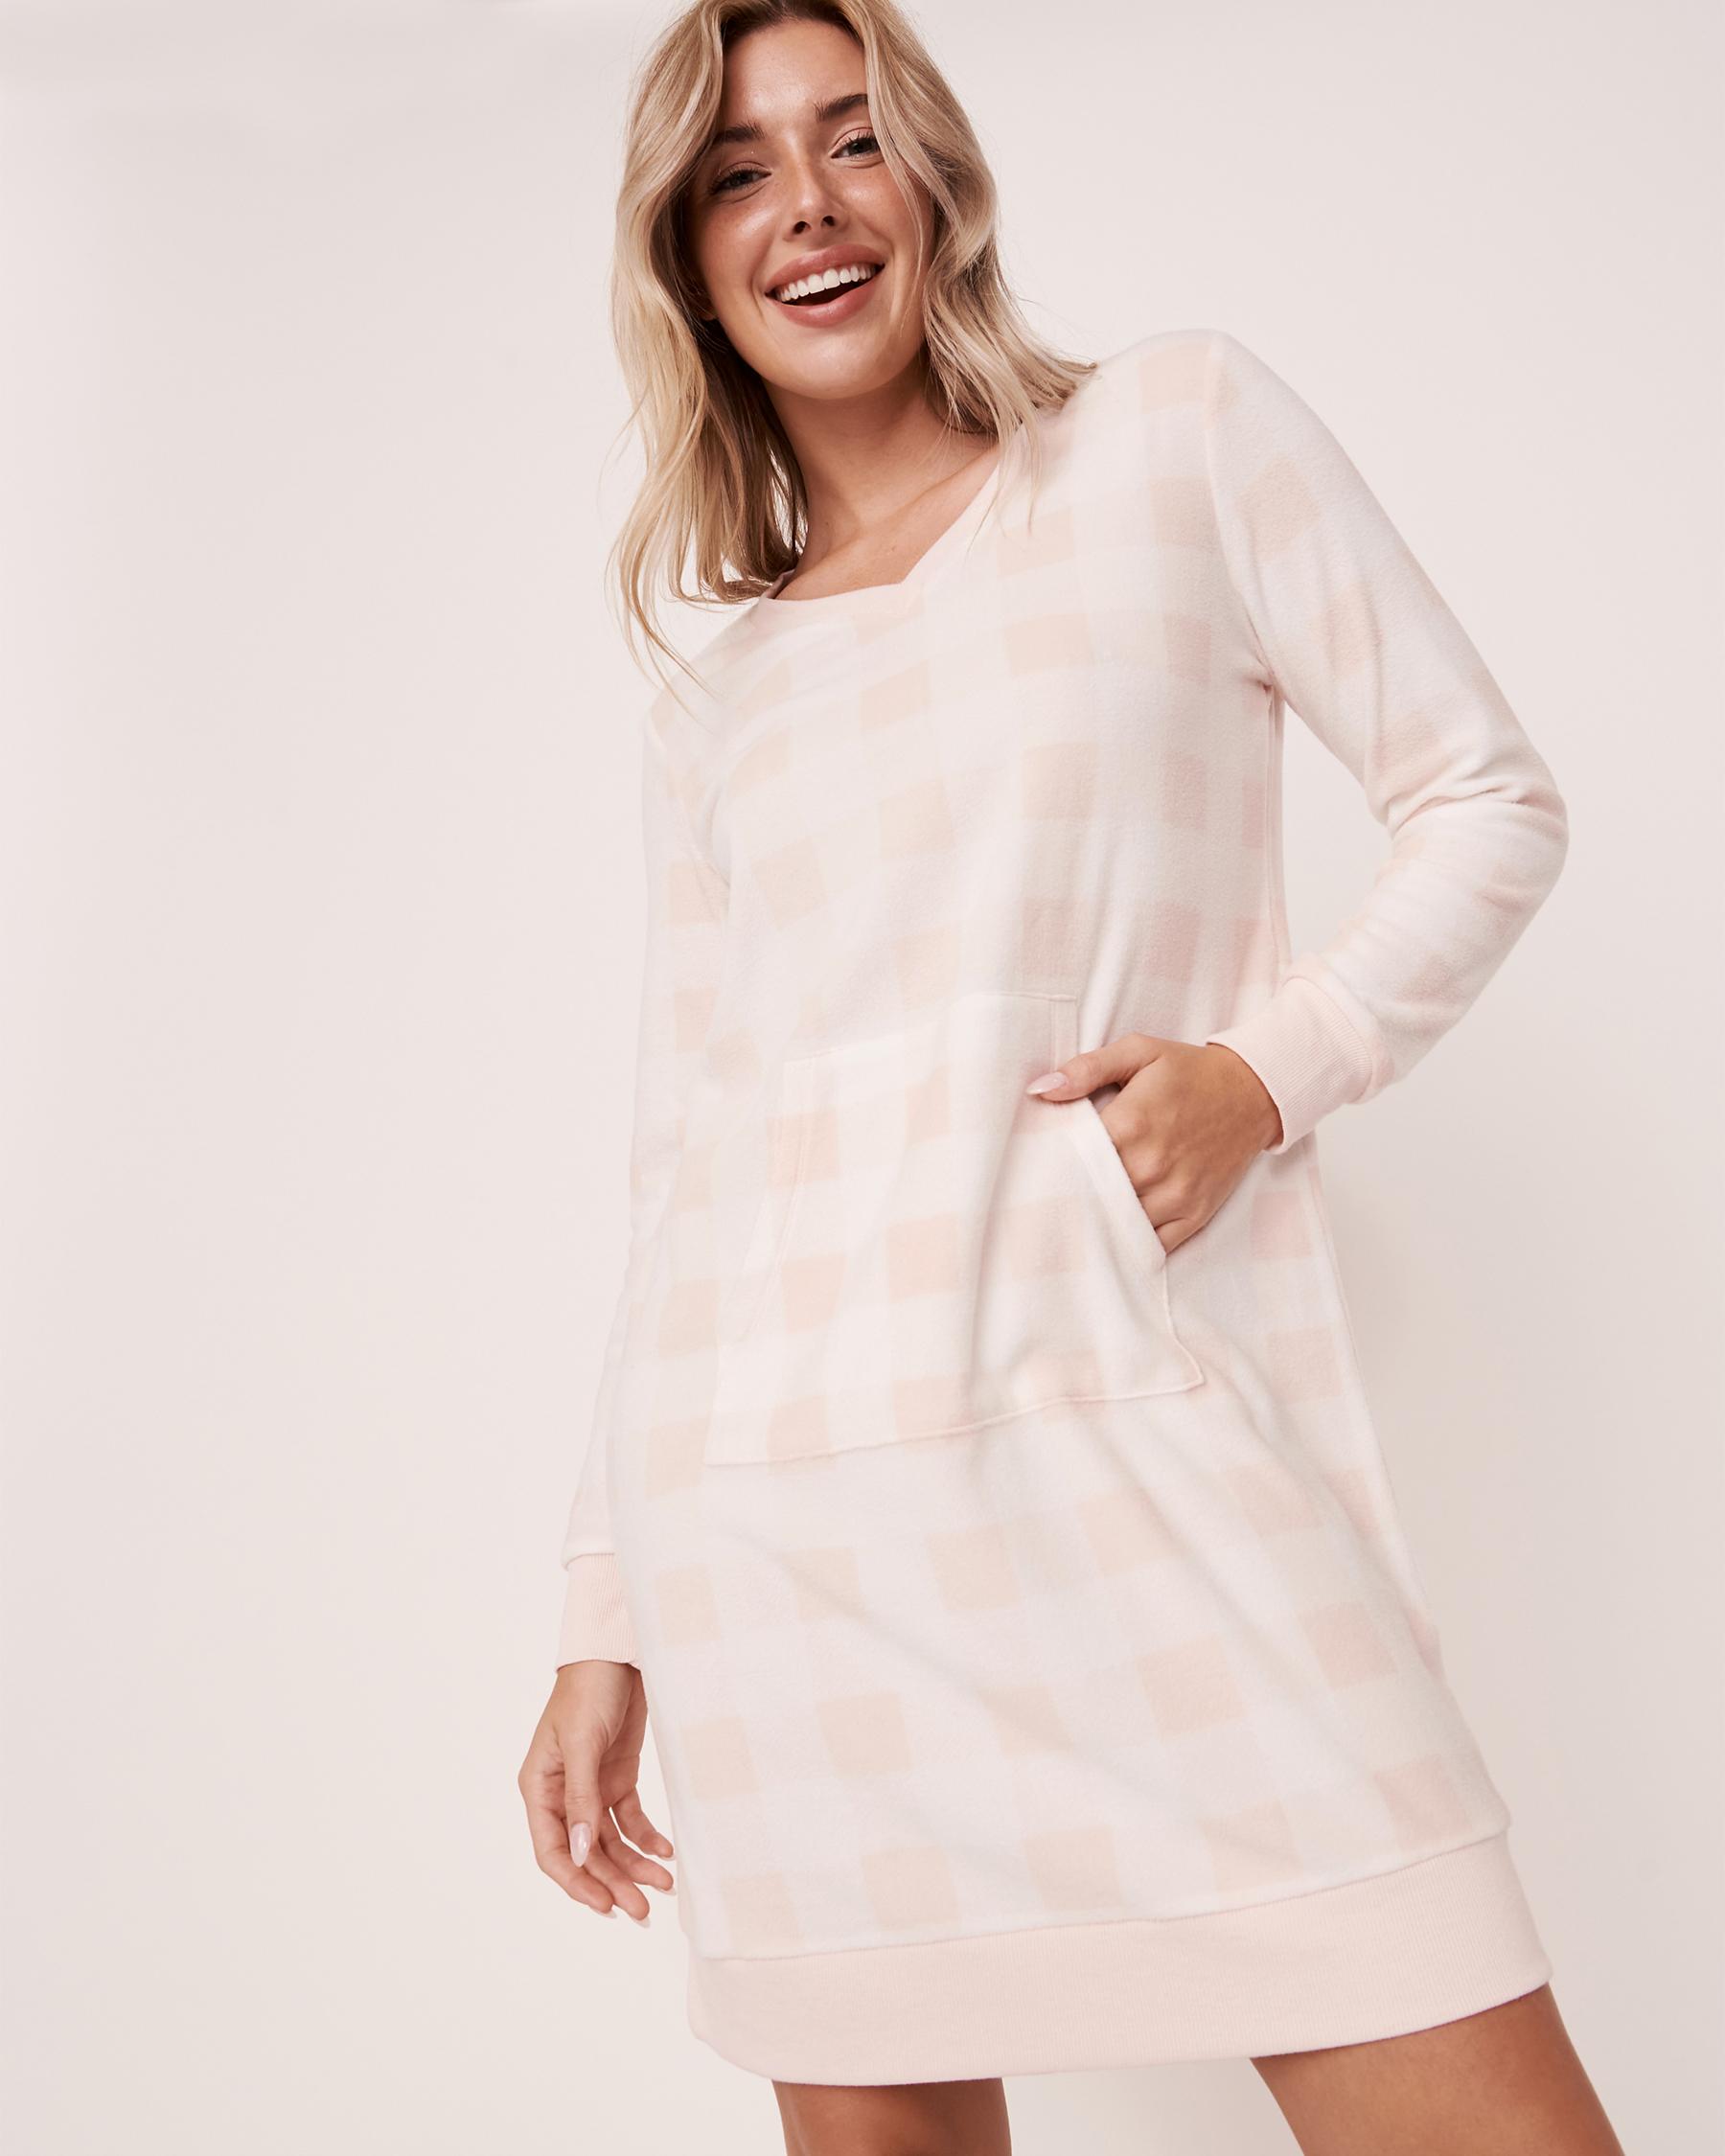 LA VIE EN ROSE Micropolar Long Sleeve Sleepshirt Pink vichy plaid 40500098 - View2